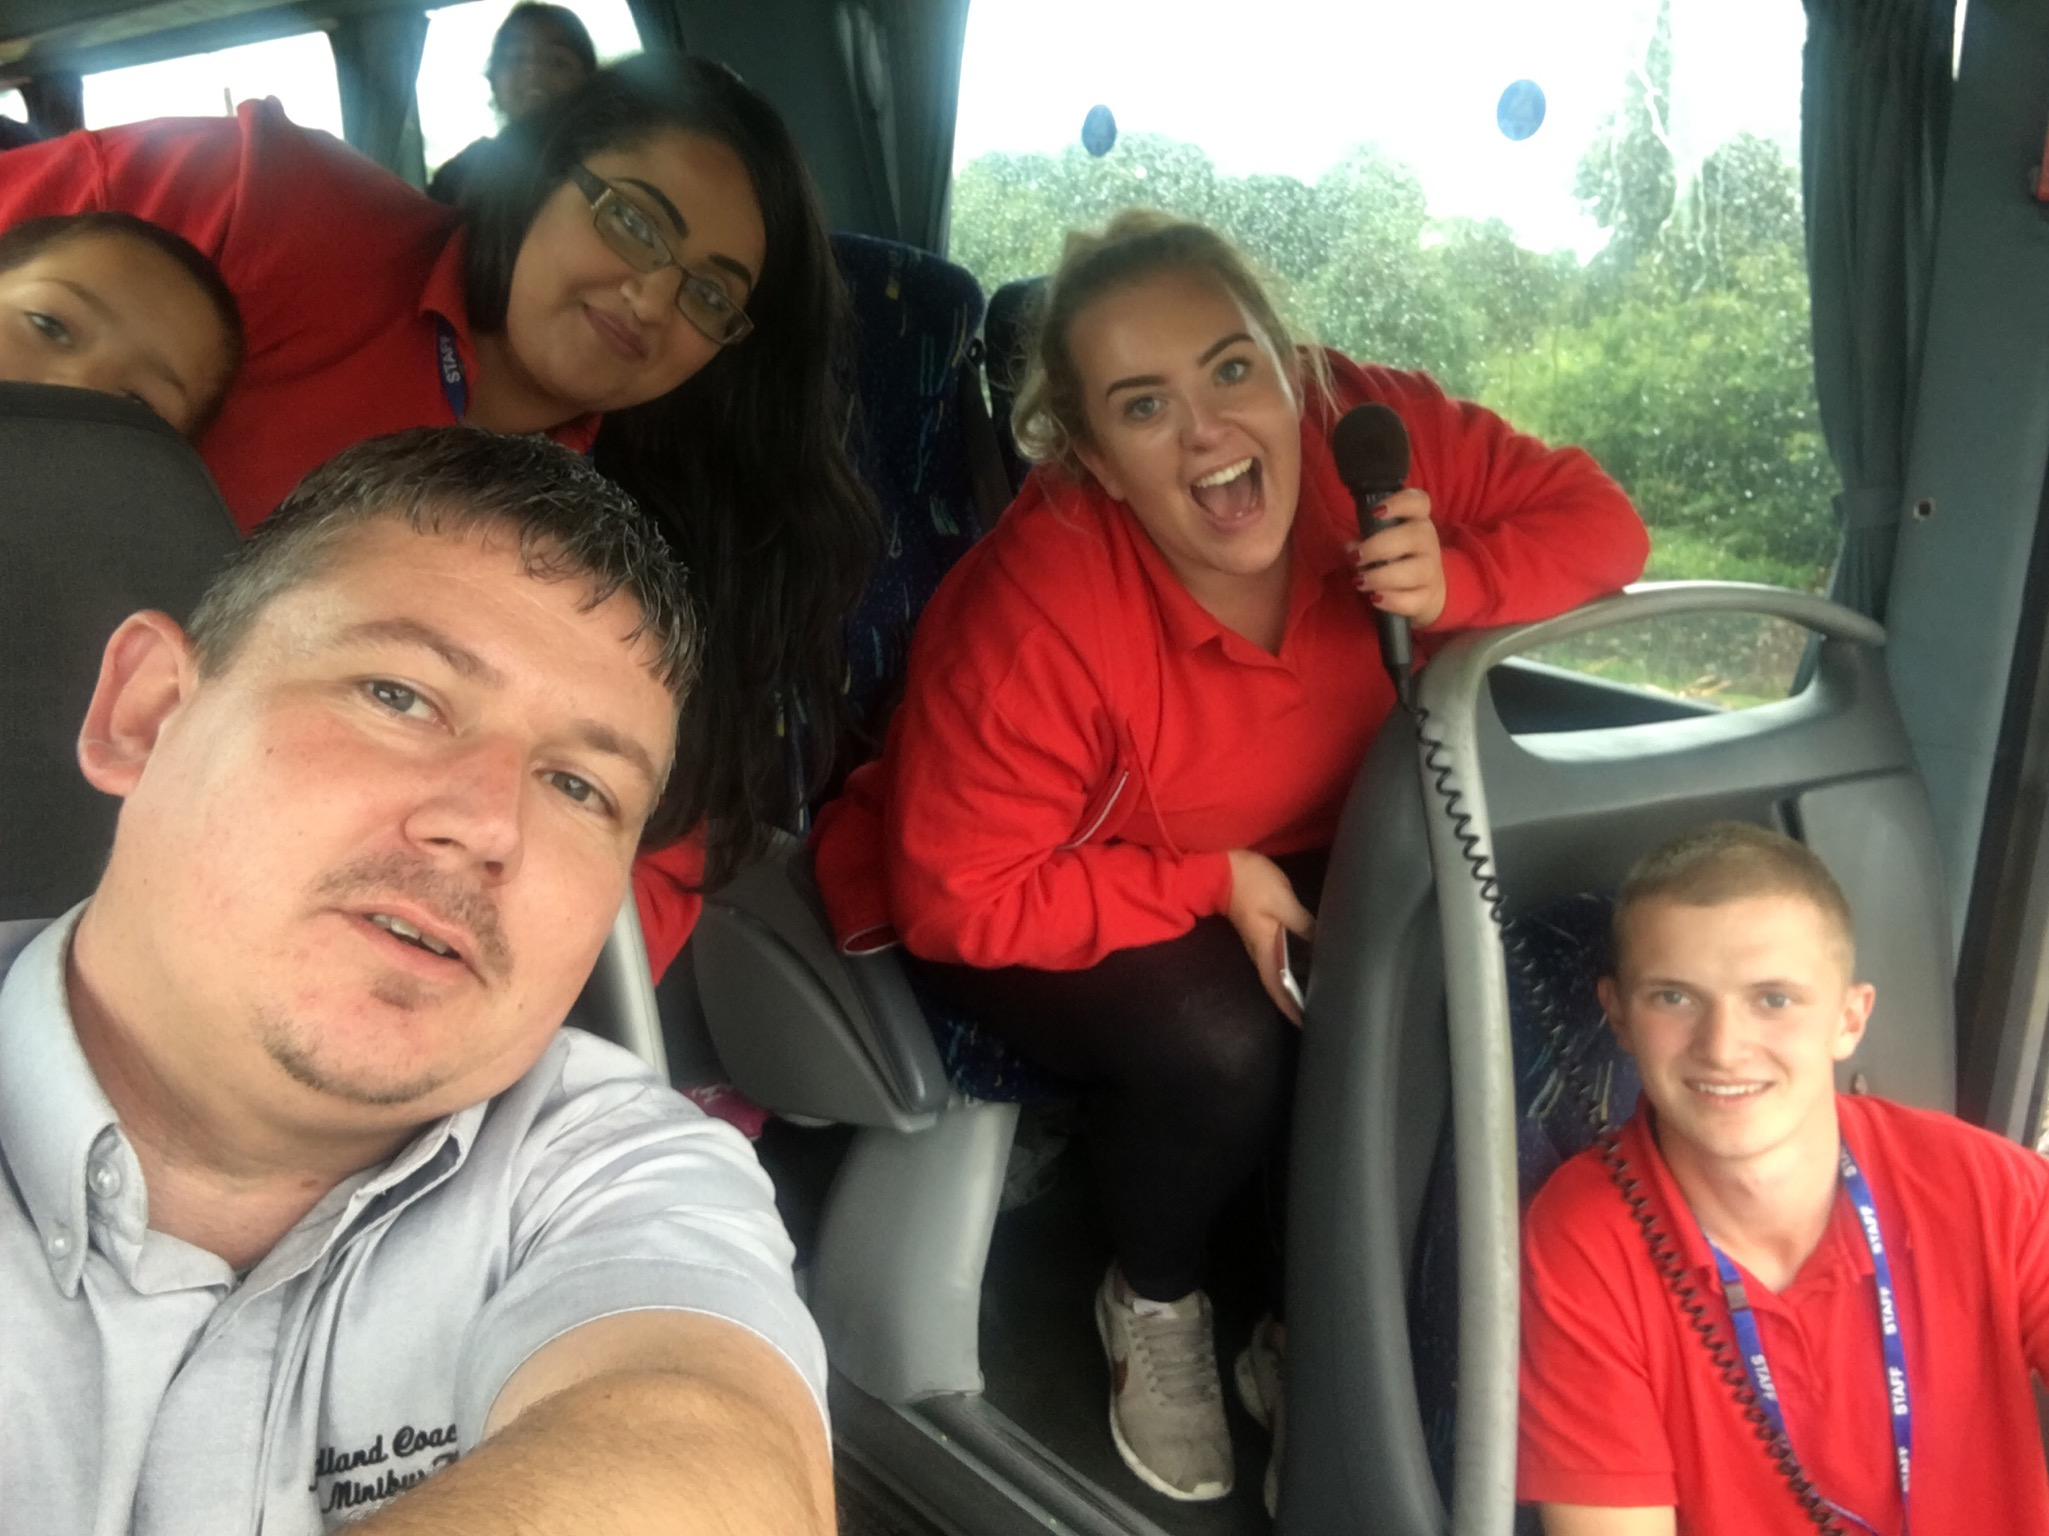 midland coach hire dudley safari park